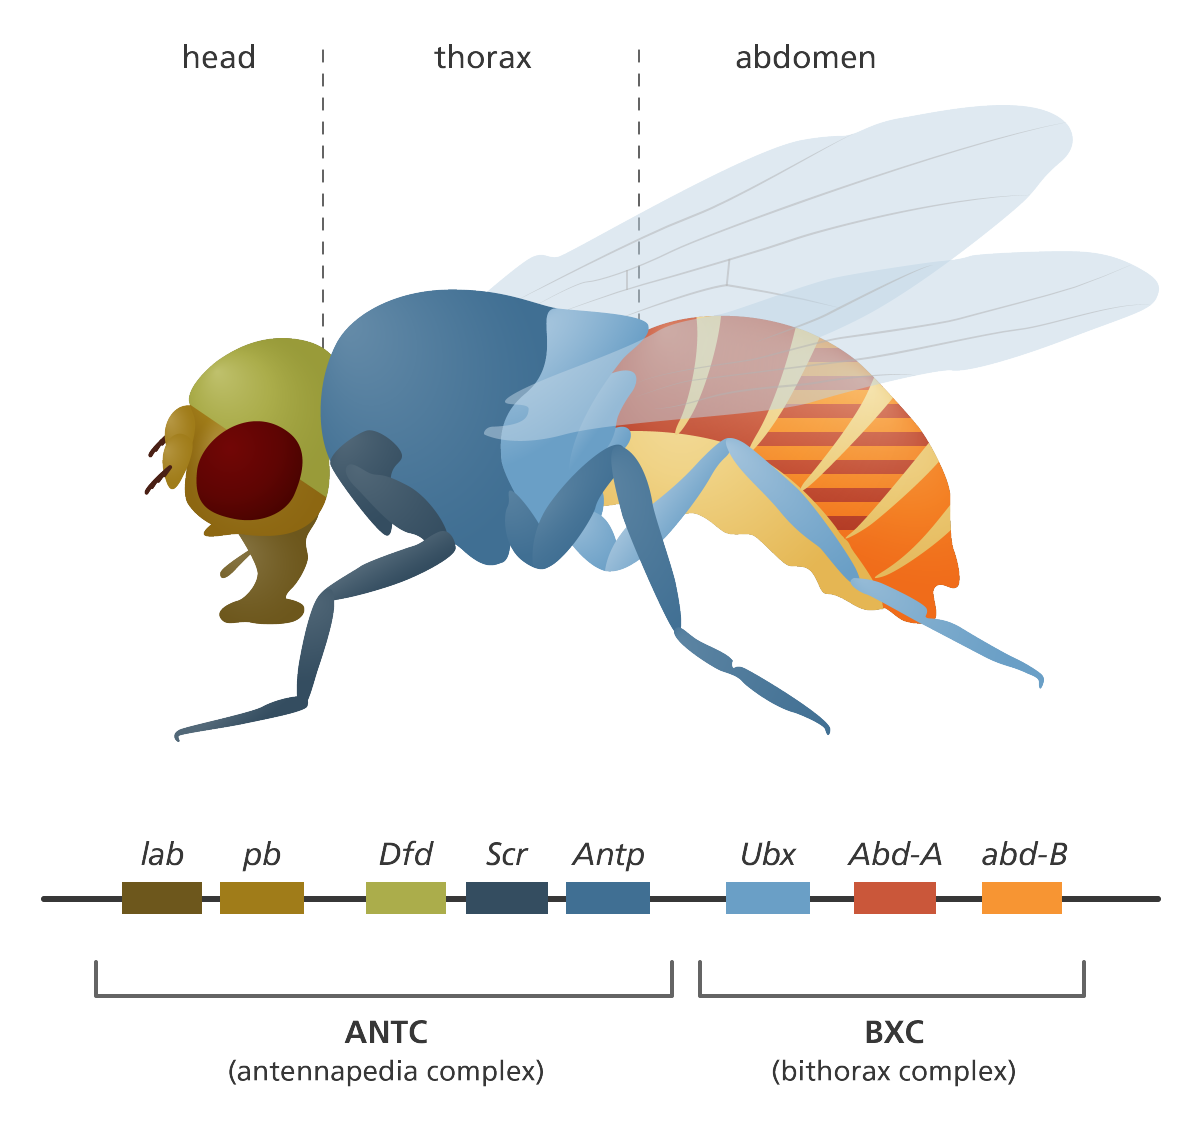 Fruit flies in the laboratory | Illustrating genomics | Pinterest